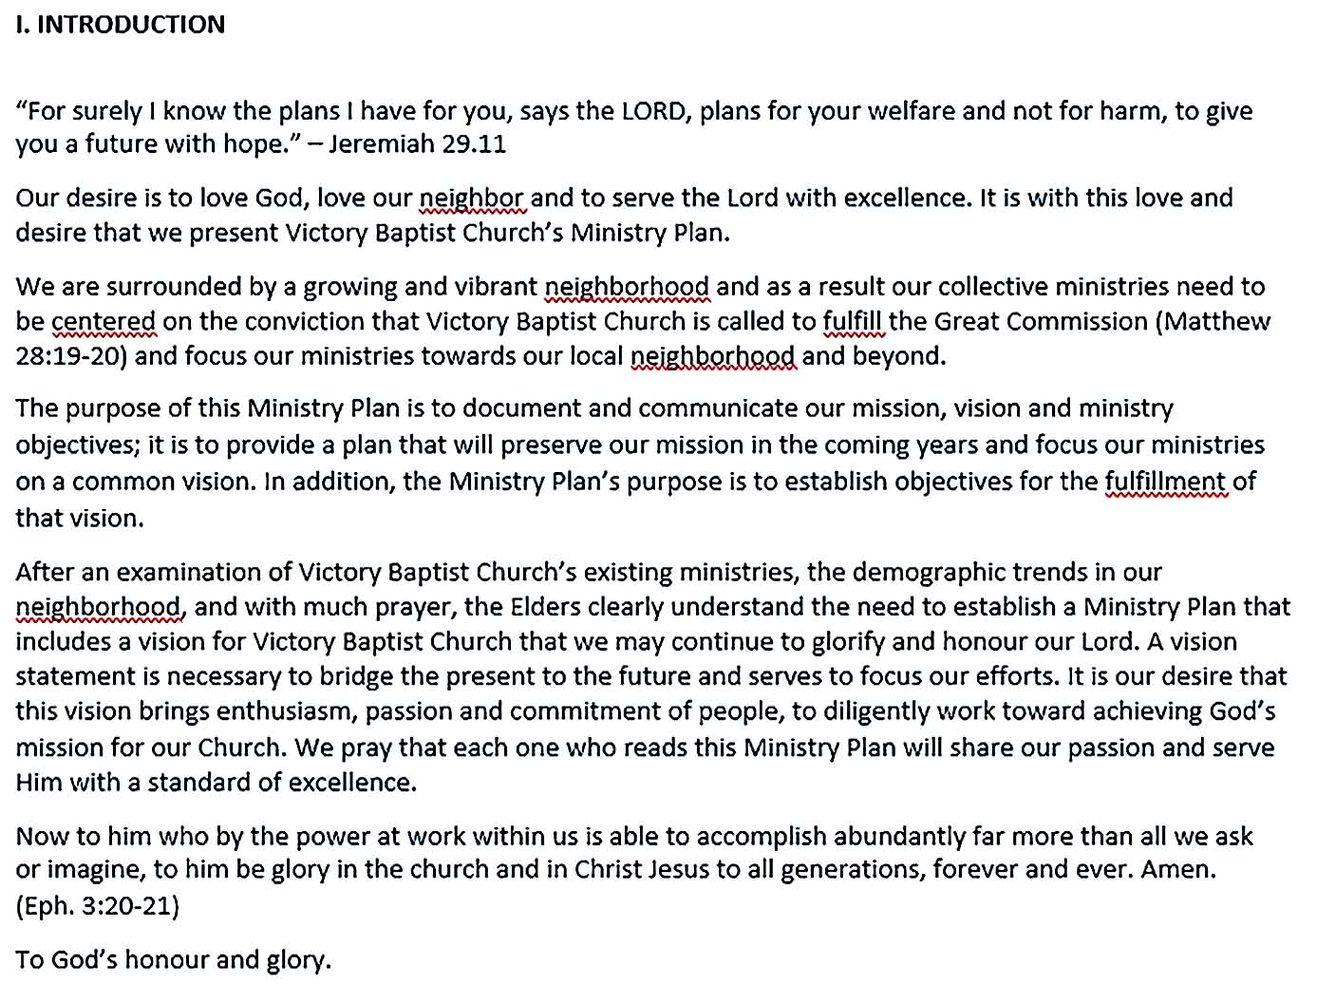 pdf format victory baptisit church strategic plan free download